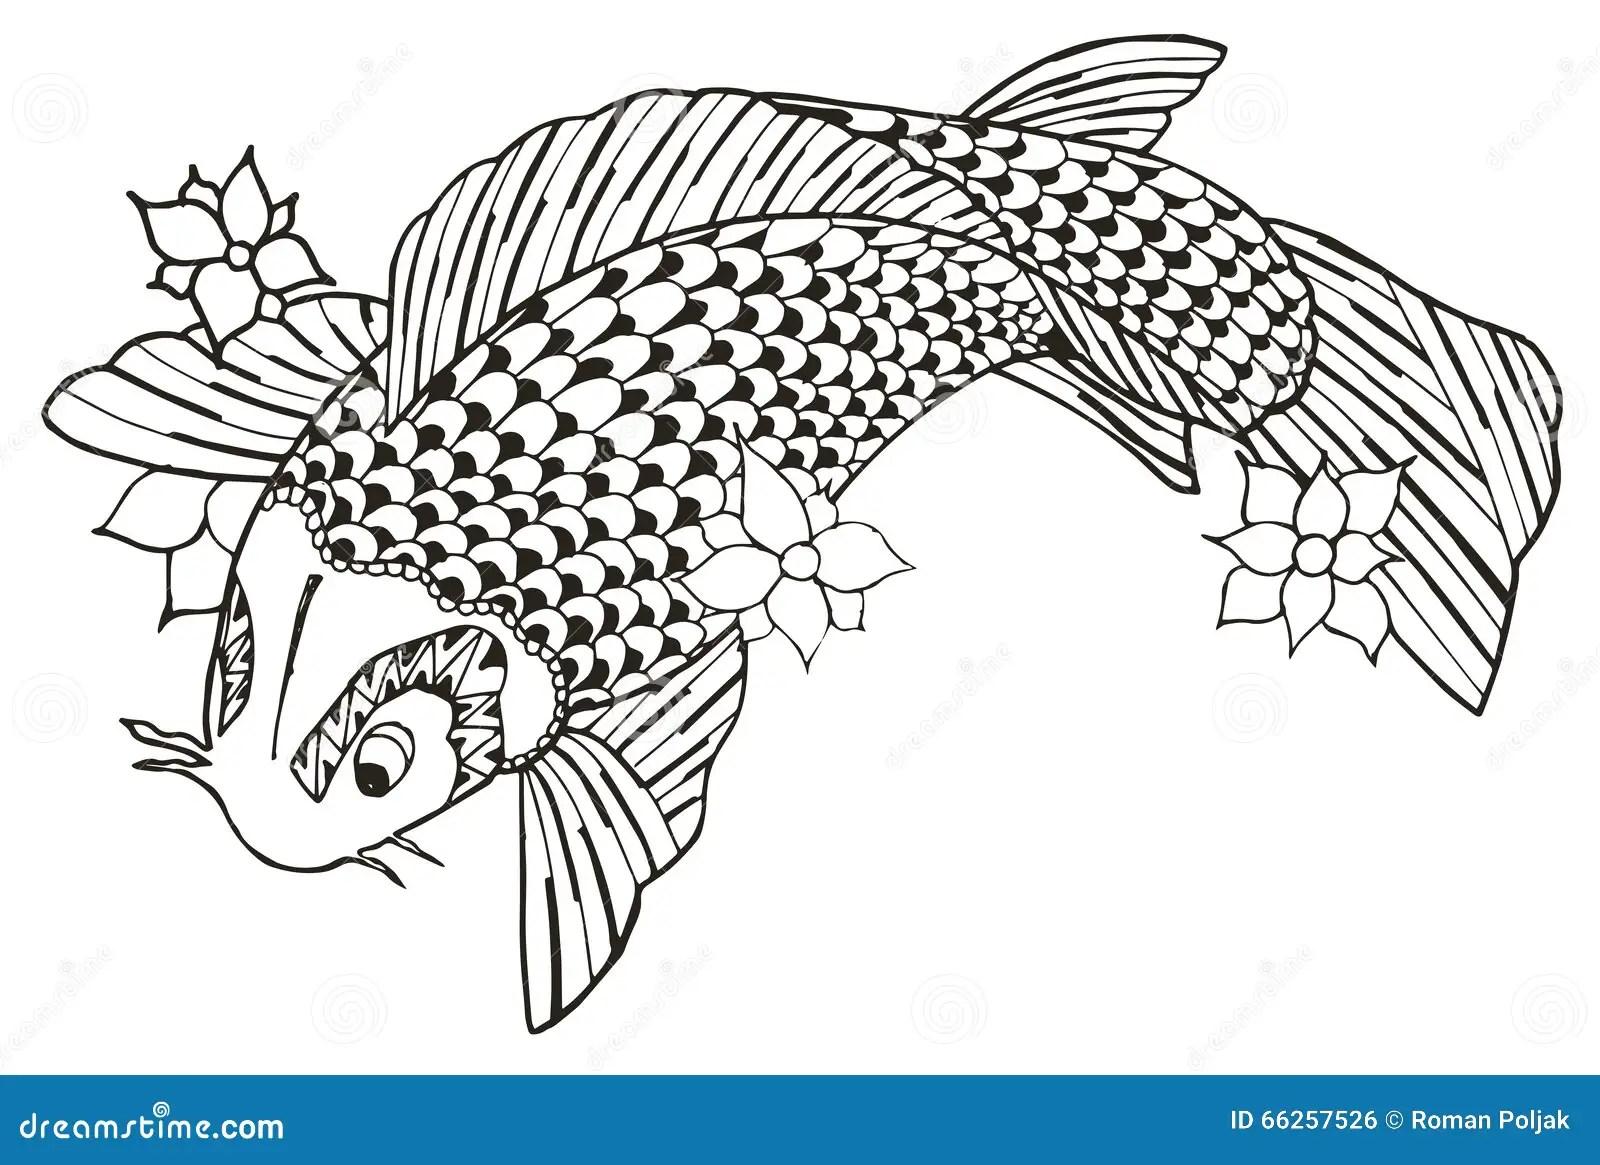 Vector Koi Fish Tattoo Cartoon Vector